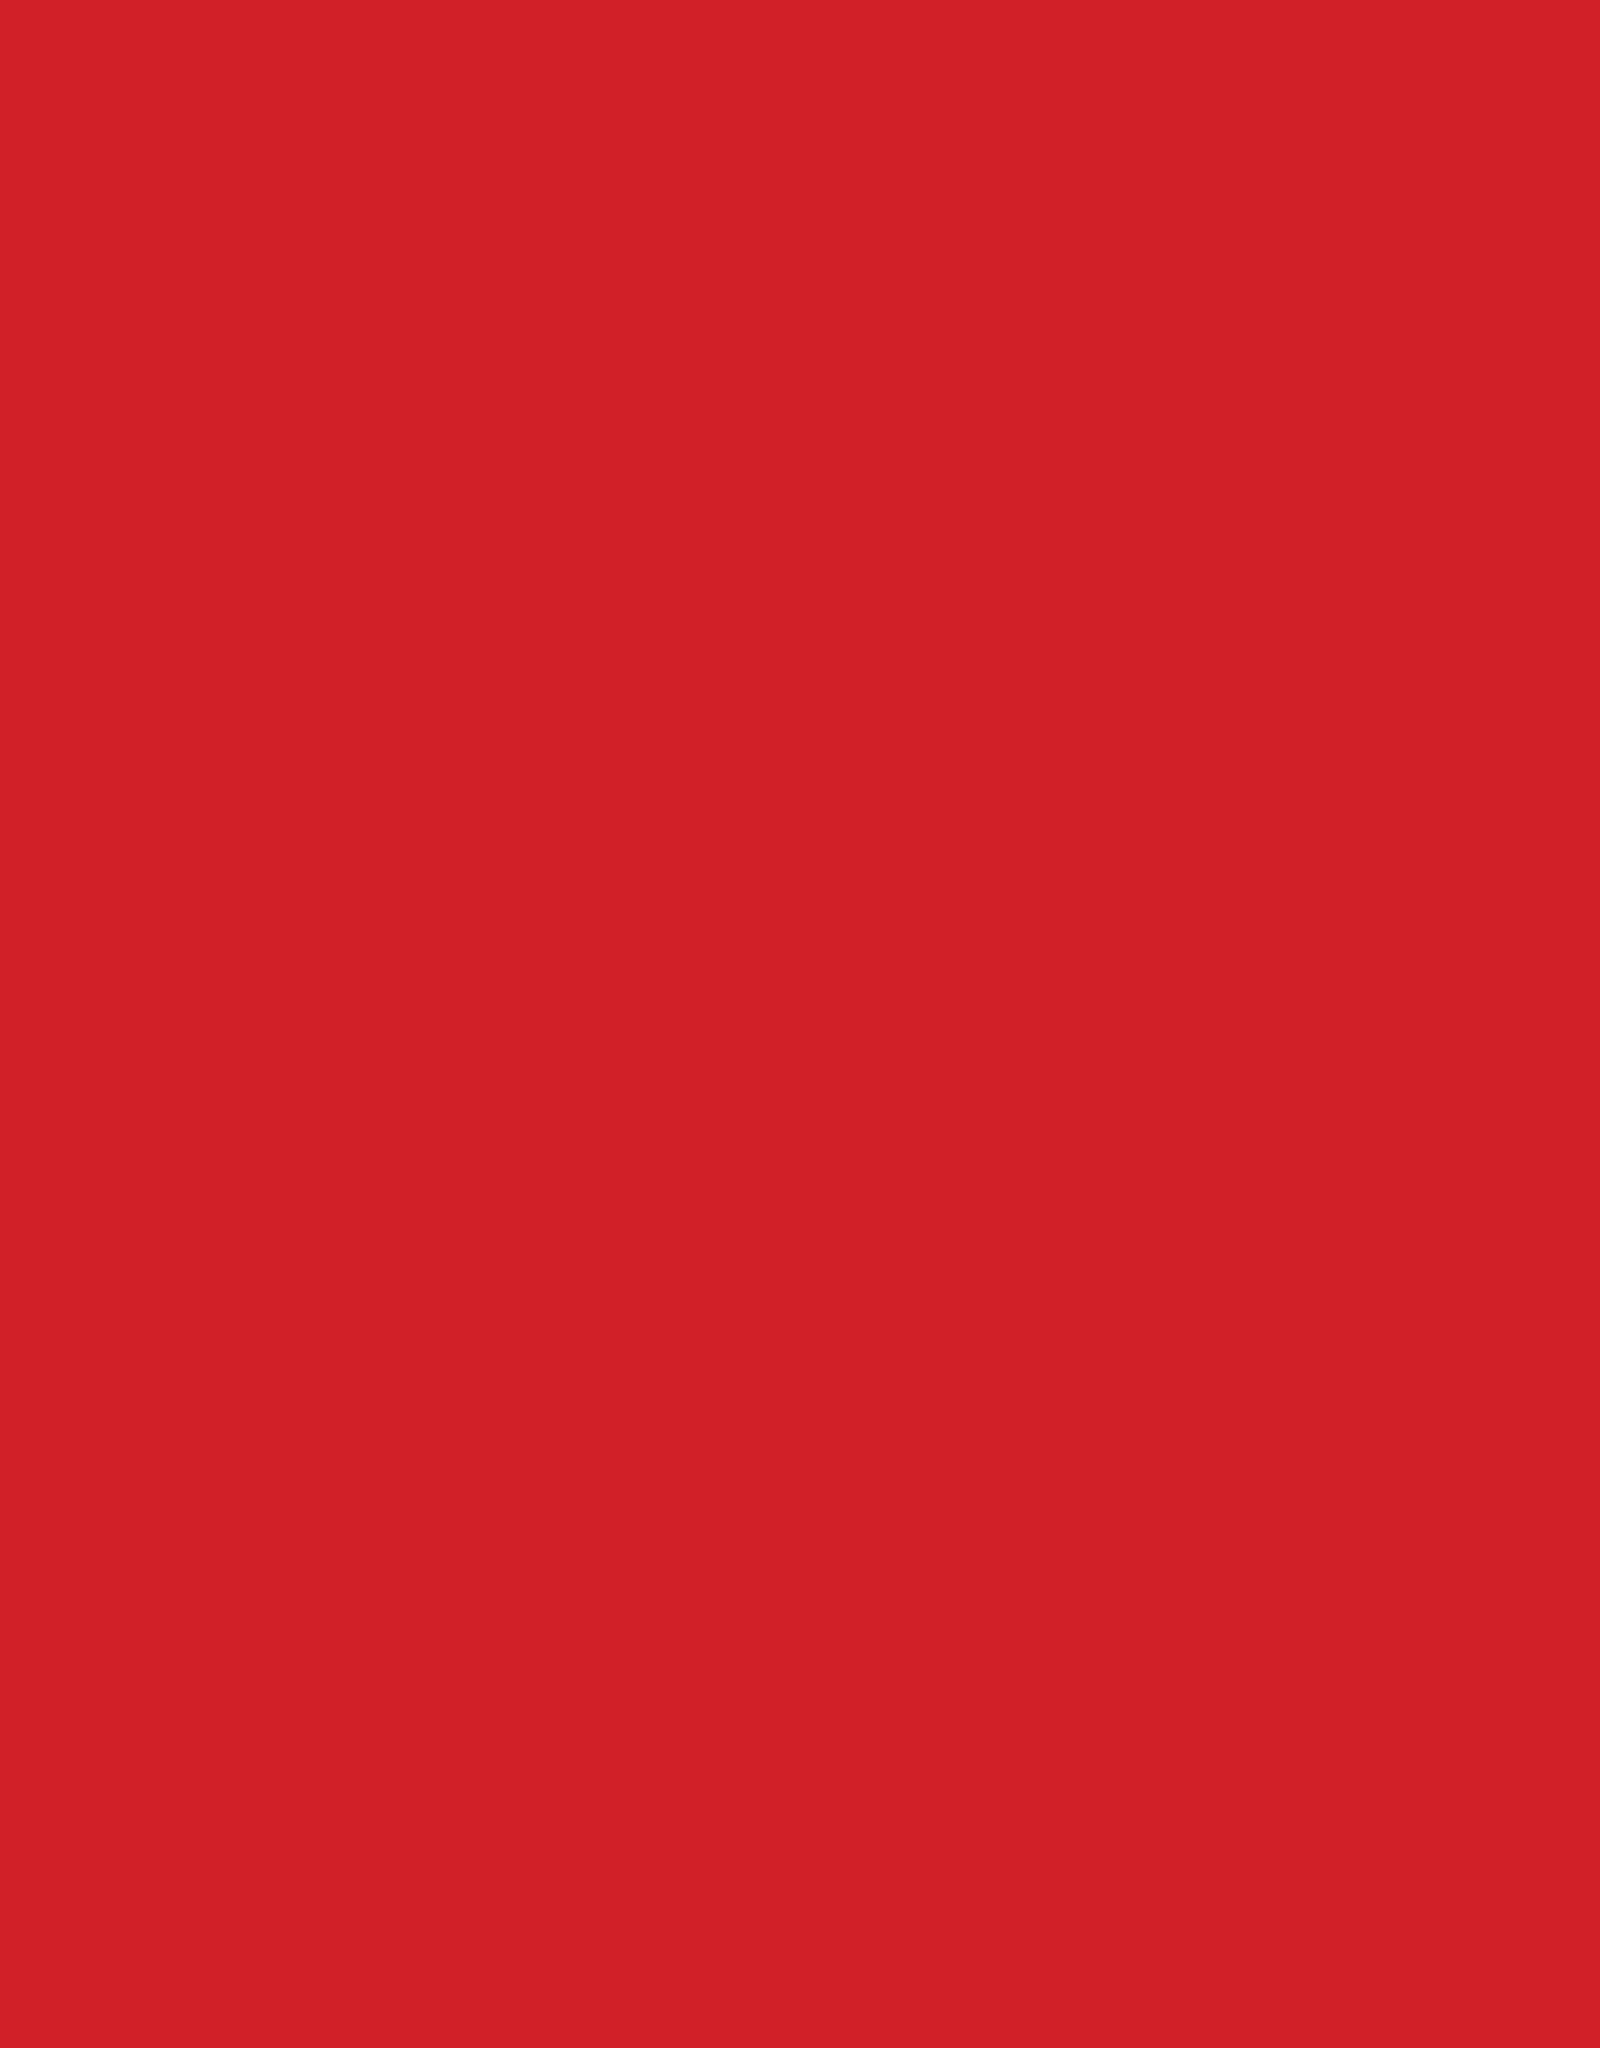 Sennelier, Egg Tempera, Cadmium Red Deep, Series 5, 21ml Tube